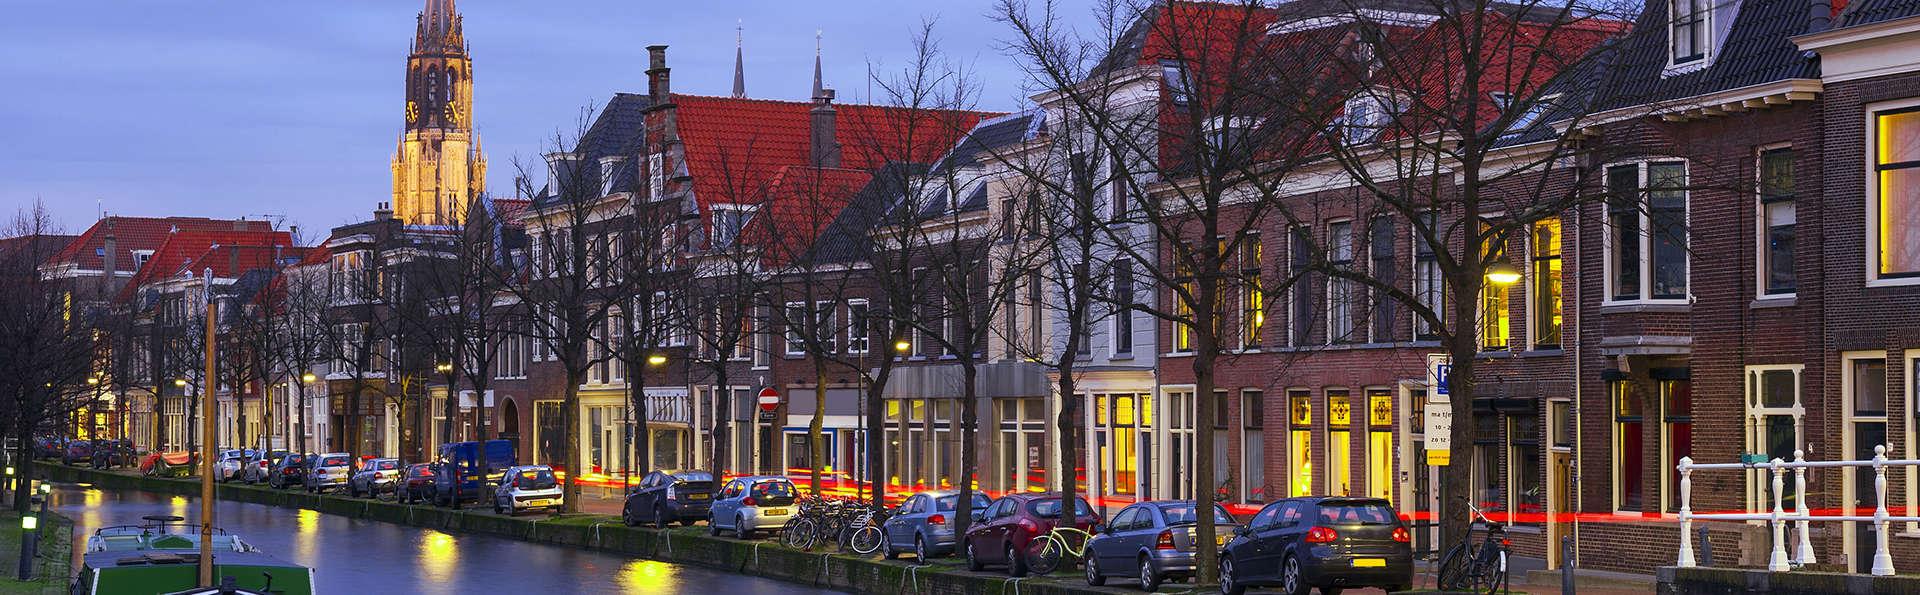 Hotel Bridges House - EDIT_Destination_Delft.jpg